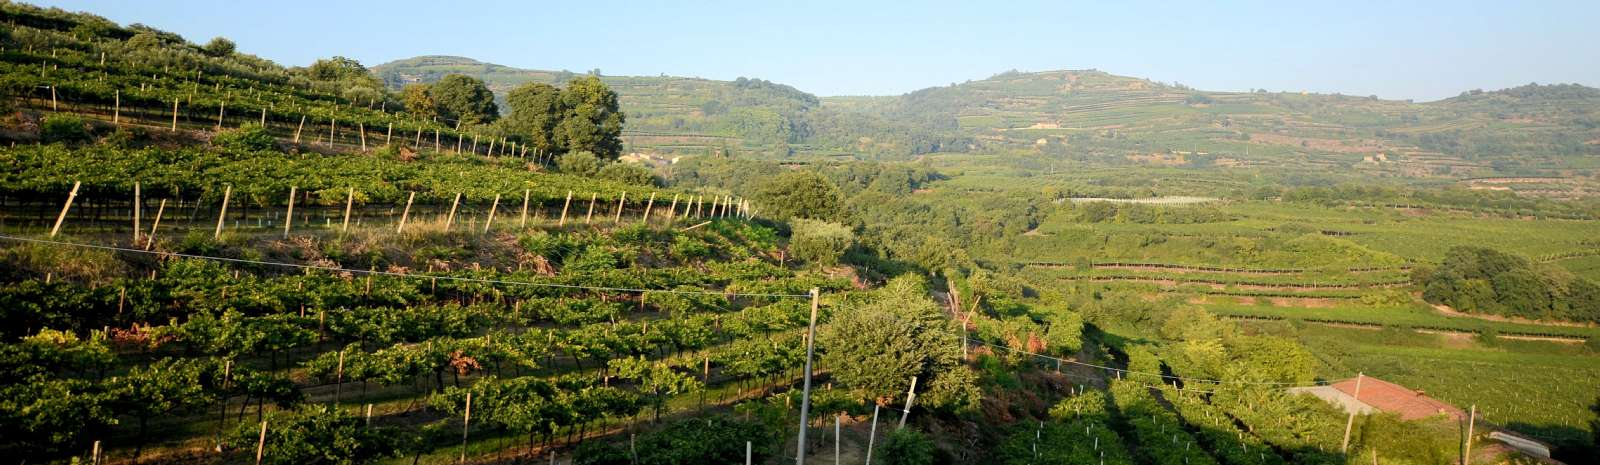 Gyldent aftenlys i Valpolicellas nabodistrikt Soave